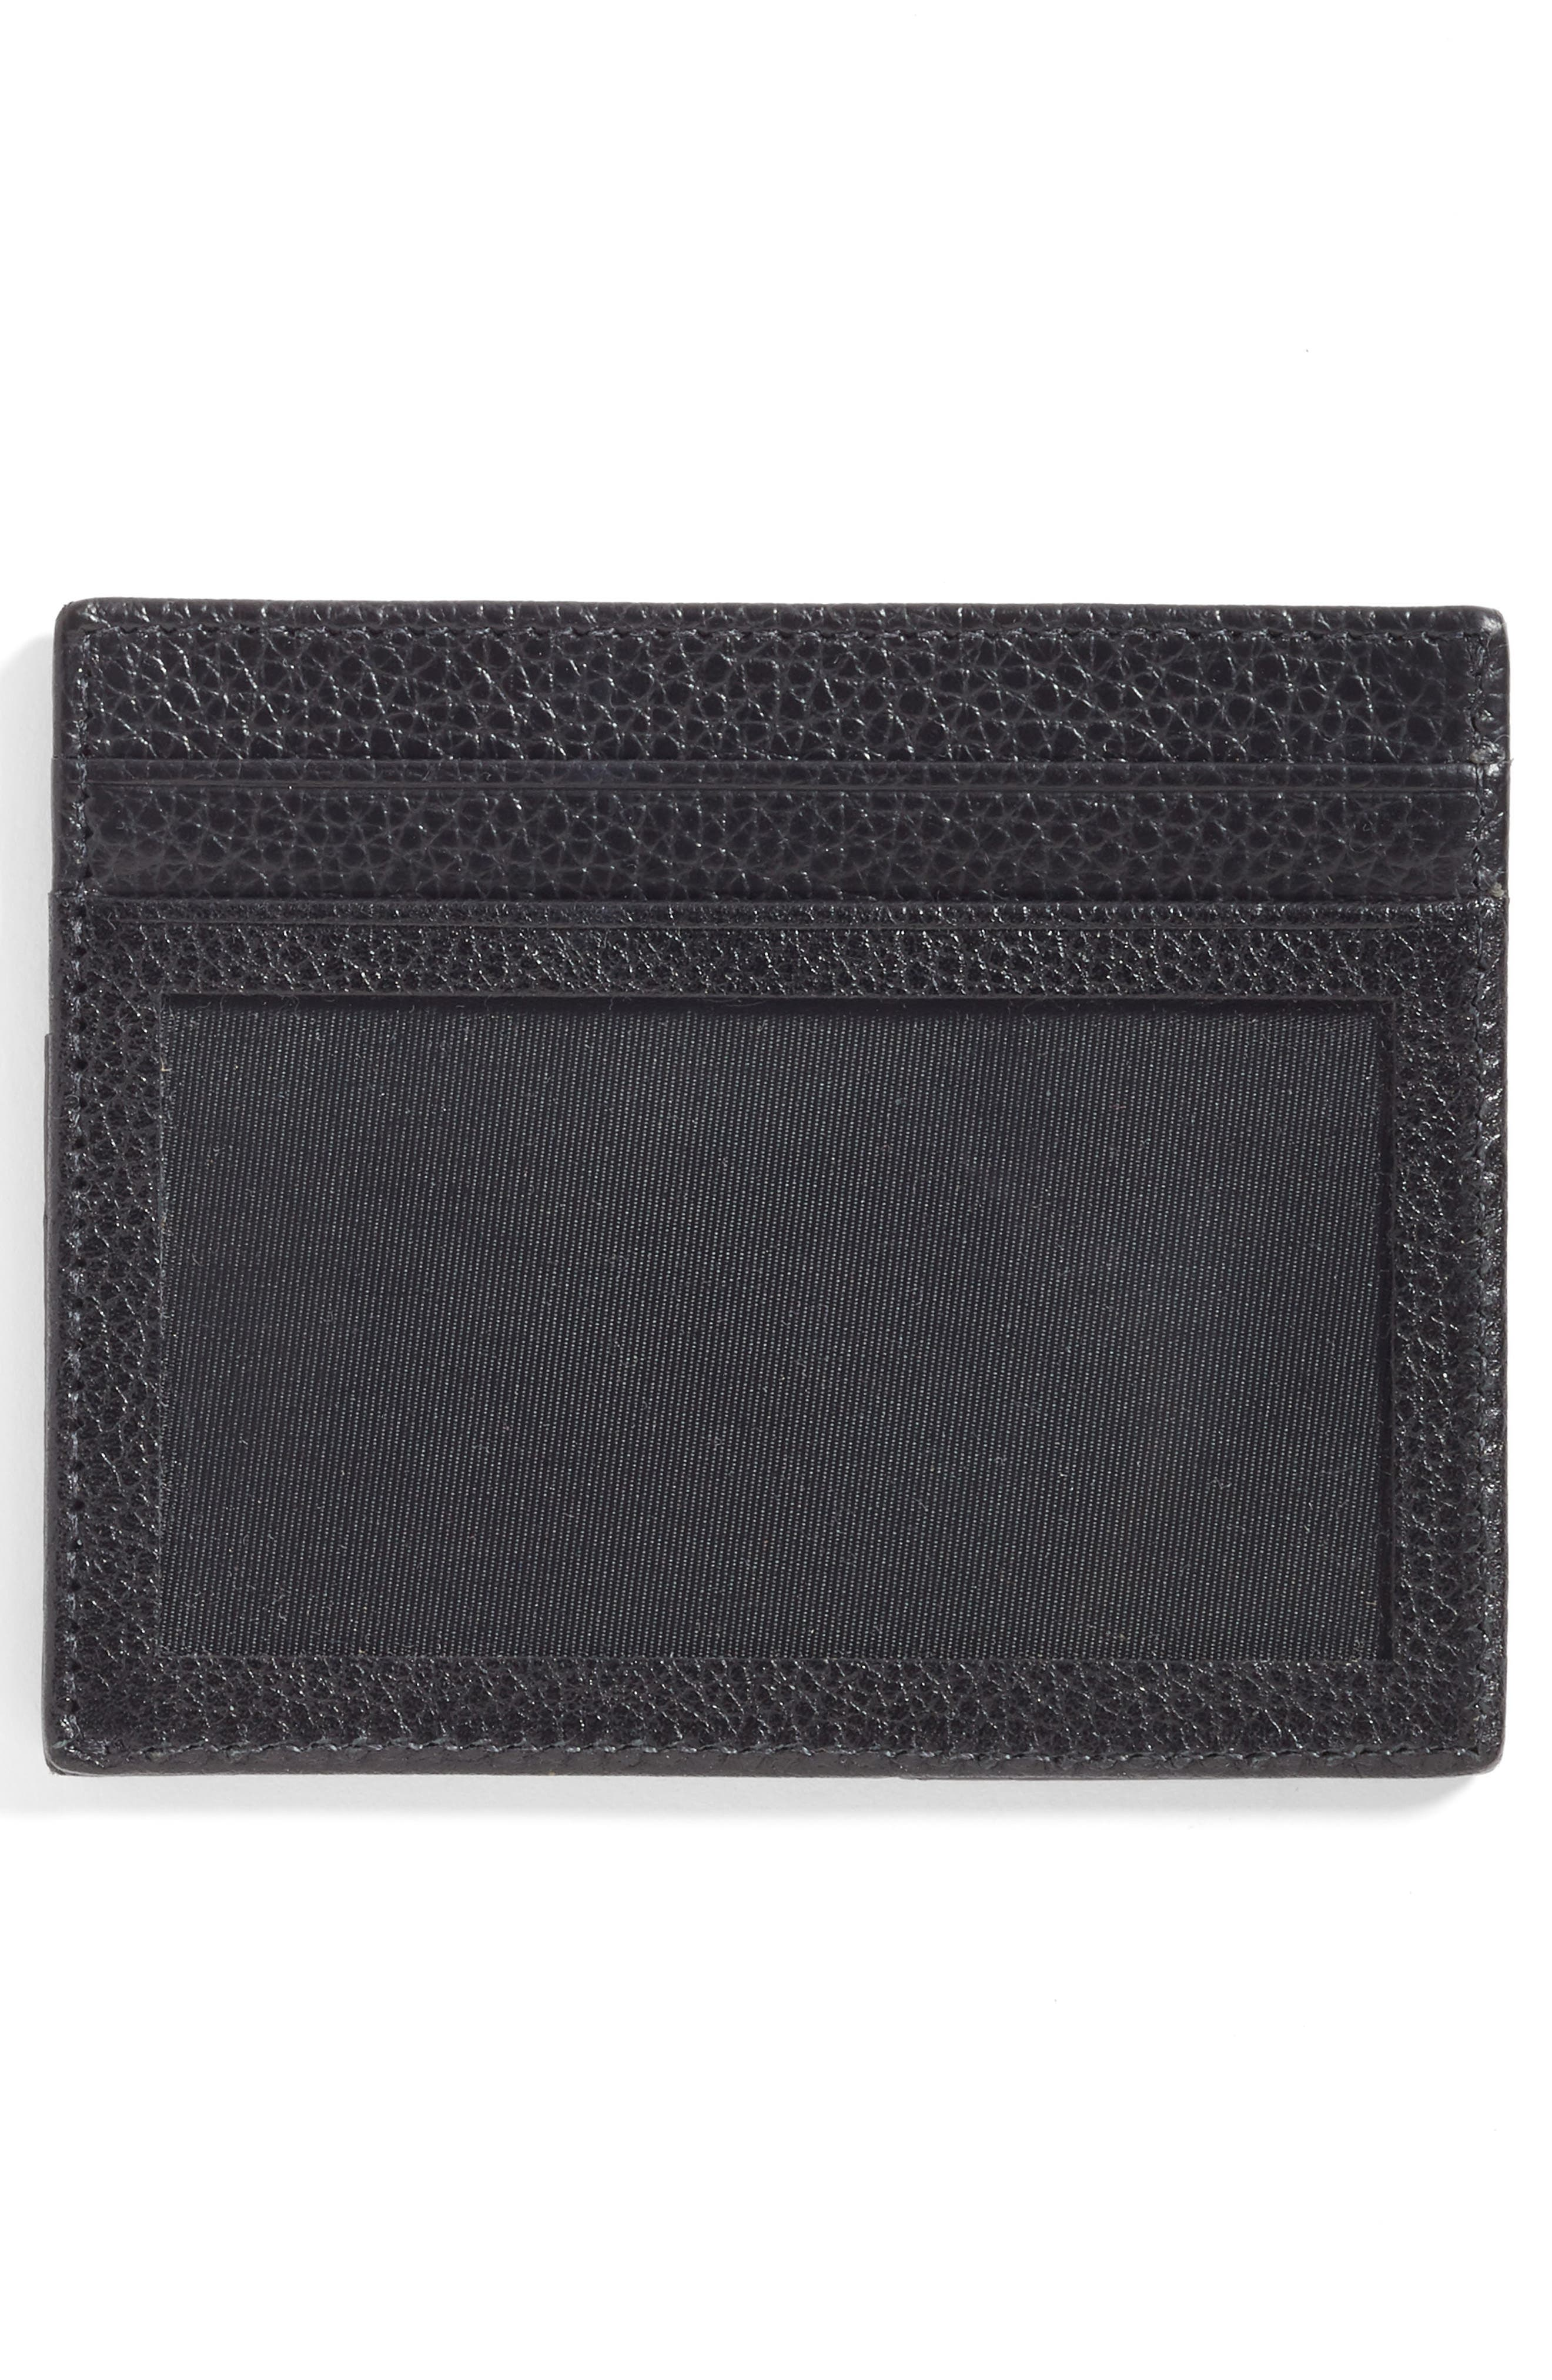 Executive Leather Card Case,                             Alternate thumbnail 2, color,                             001